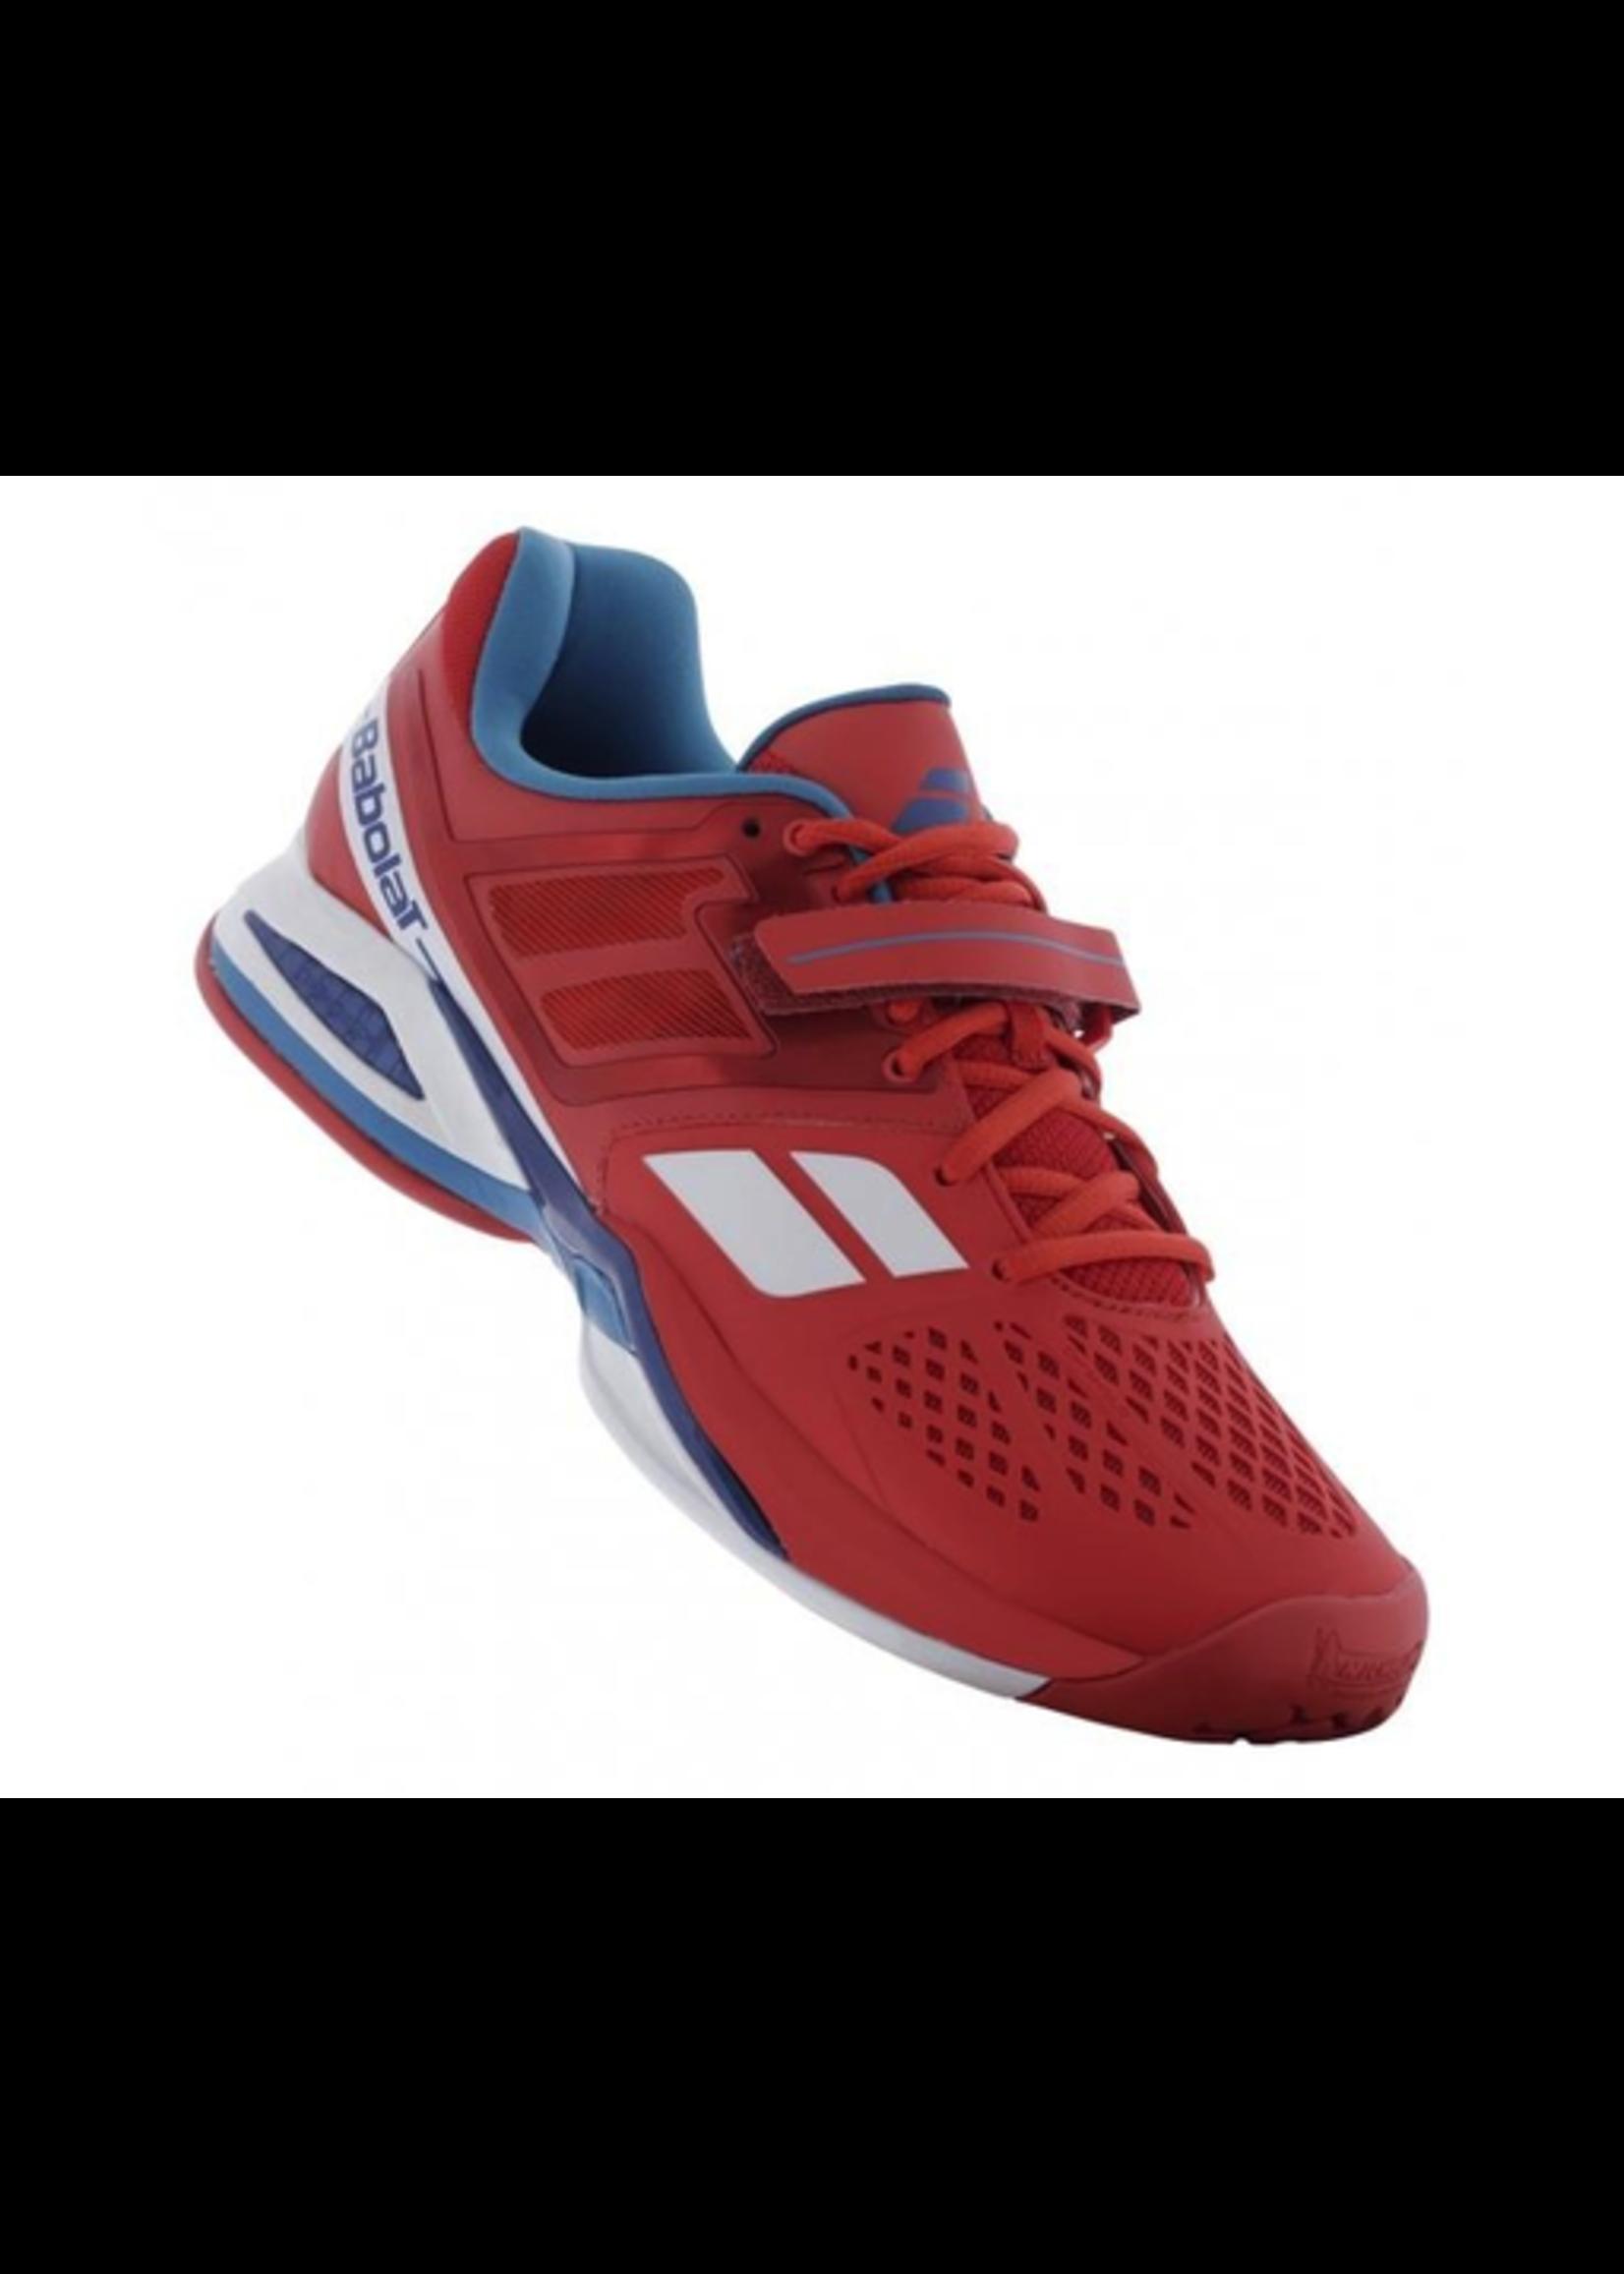 Babolat Babolat Propulse BPM Mens A/C Tennis Shoe Red U 11.5